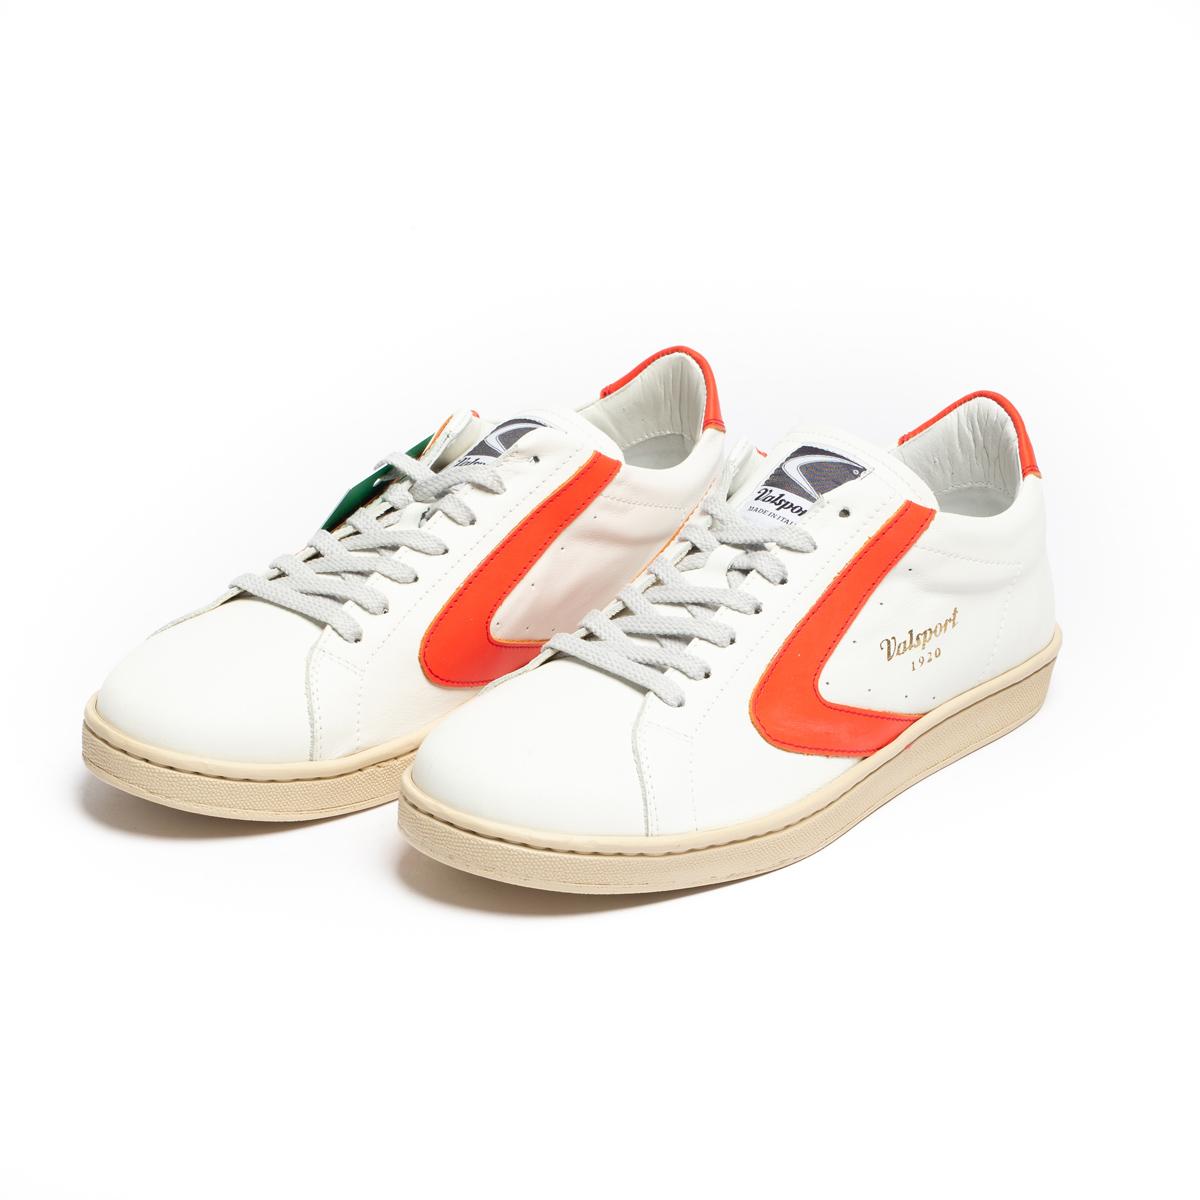 Sneaker Valsport Tournament Boomerang Arancio